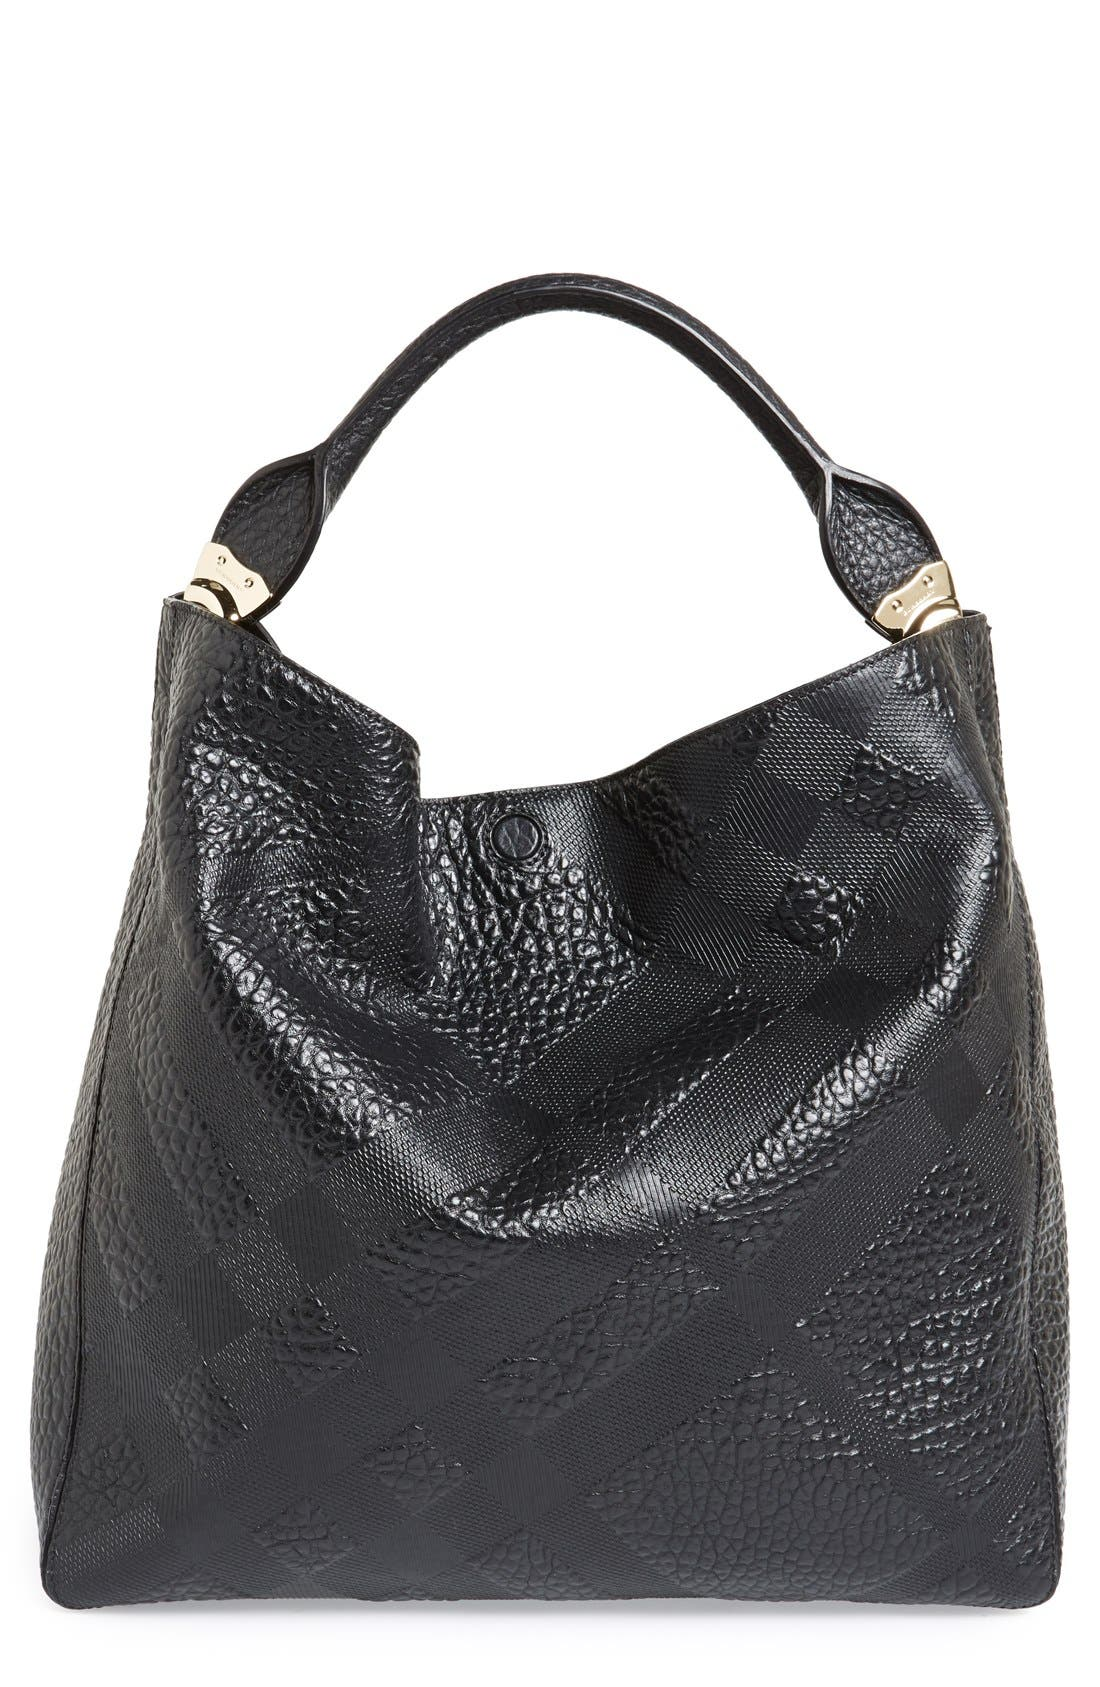 Alternate Image 1 Selected - Burberry 'Medium Lindburn' Check Embossed Leather Hobo